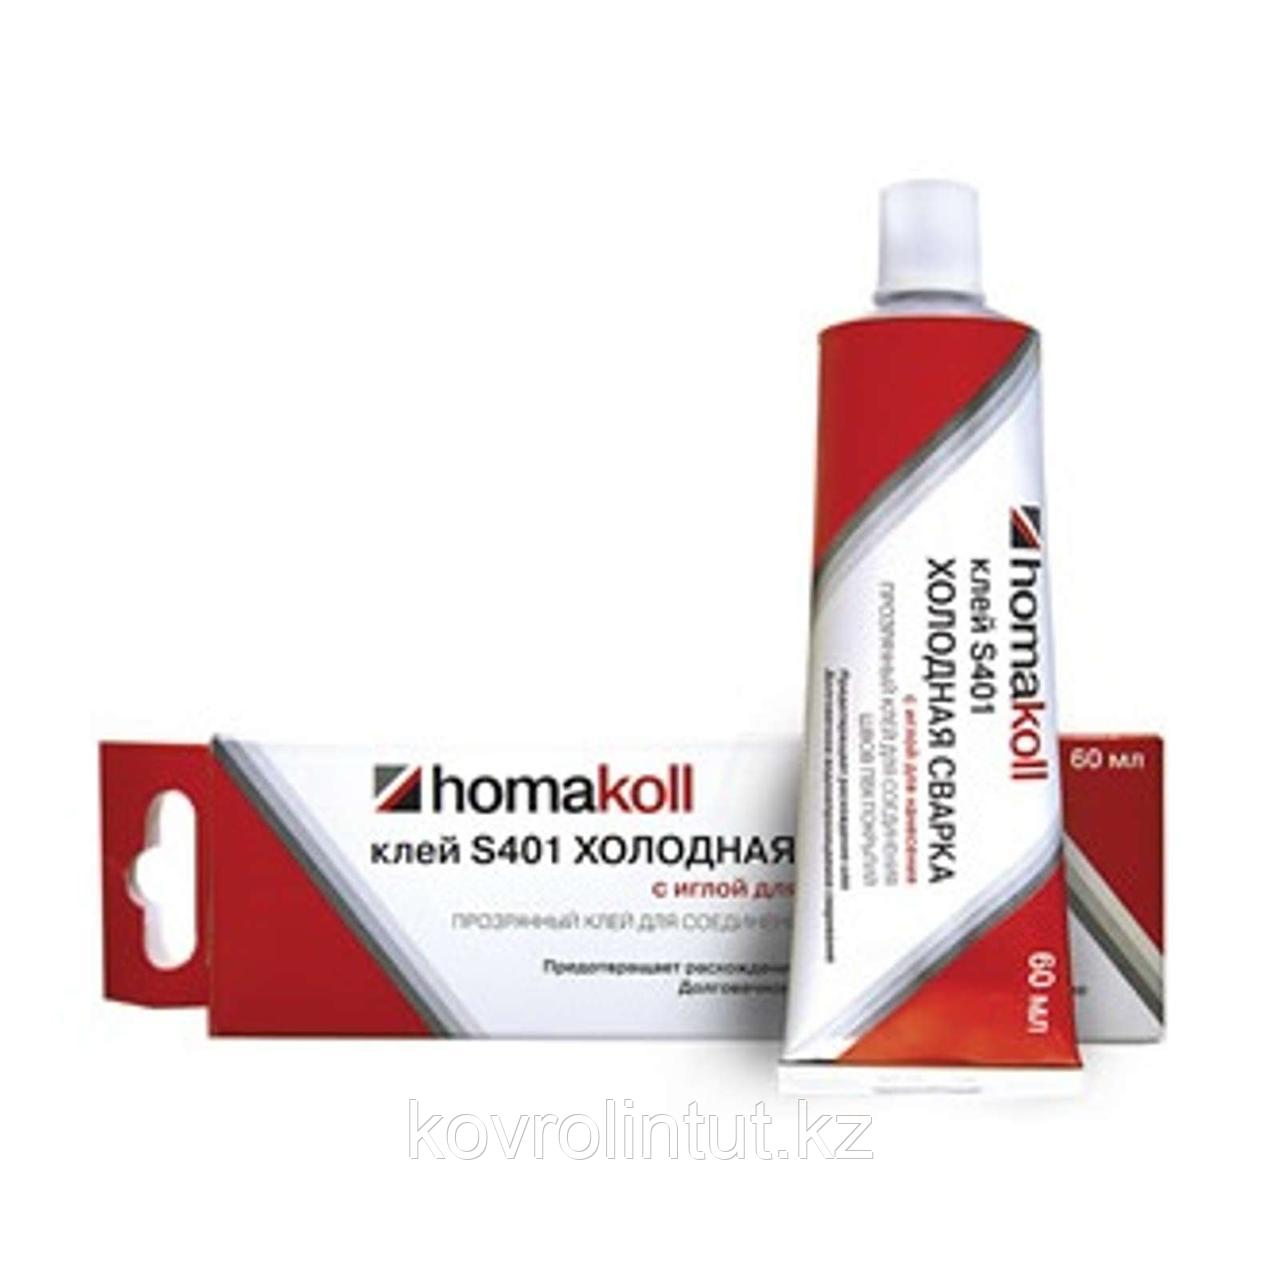 Клей холодная сварка Homakoll S401, 60гр